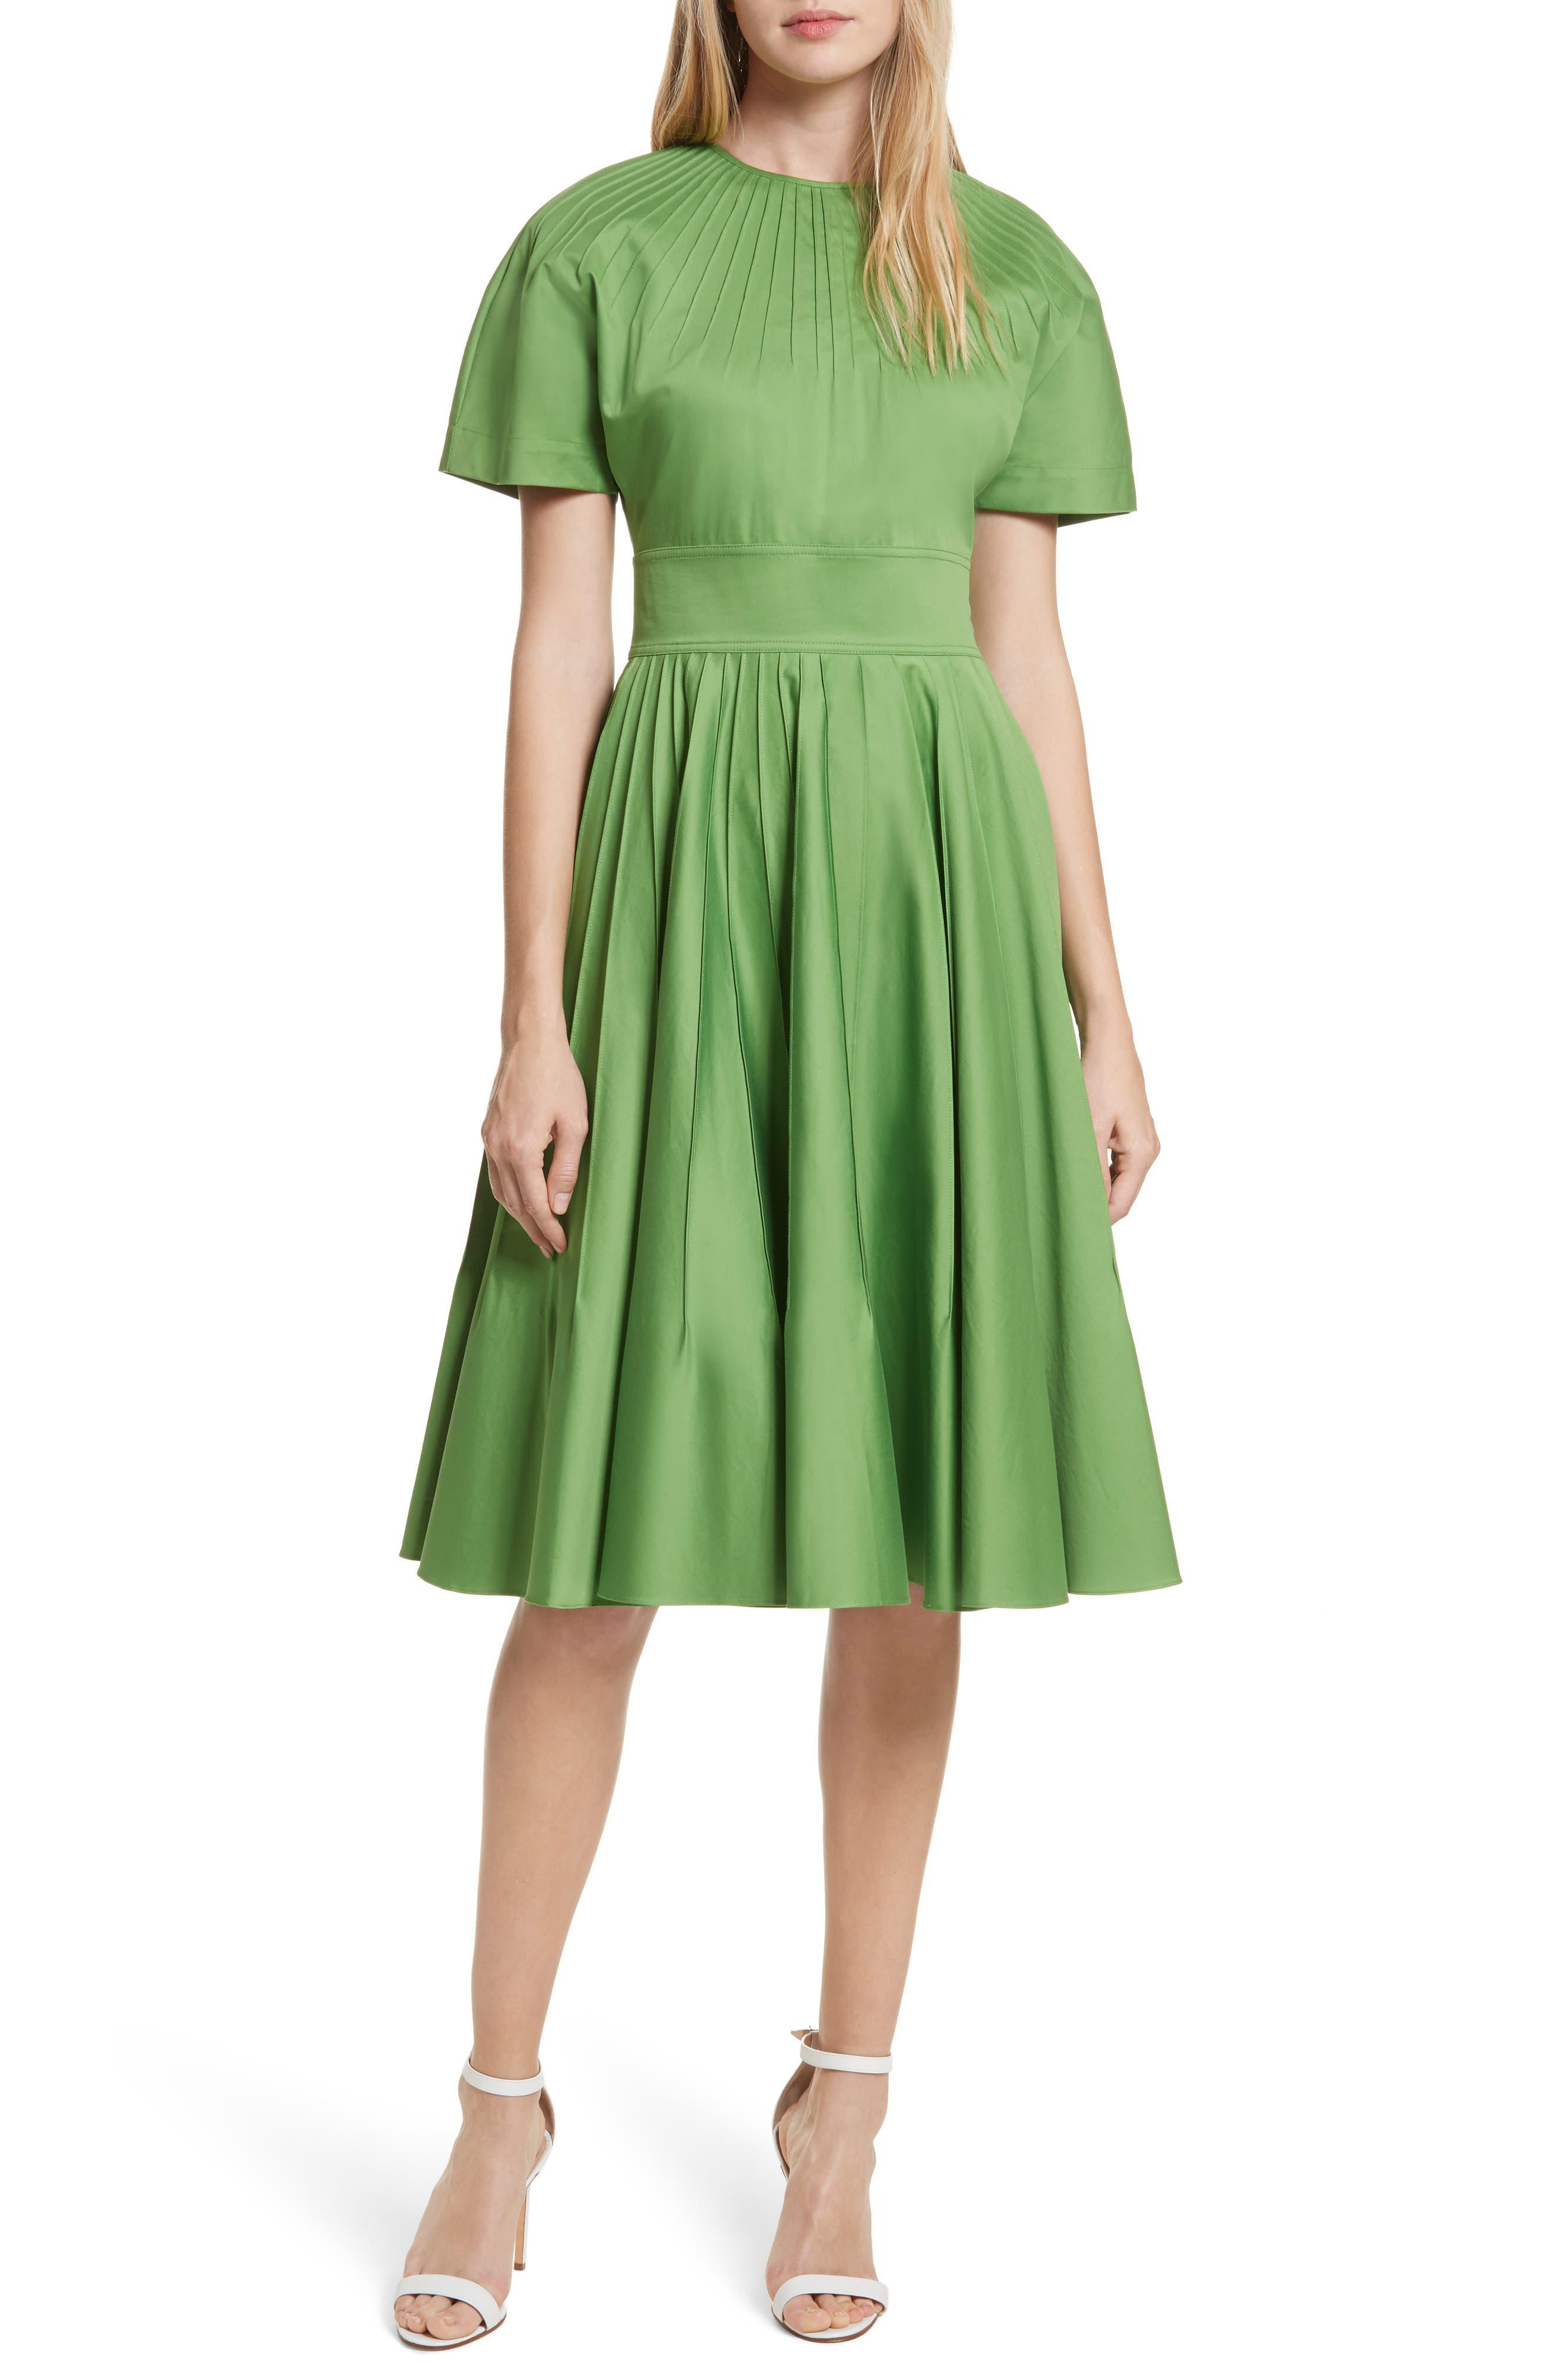 Diane von Furstenberg Pintuck Dress,                             Main thumbnail 1, color,                             315